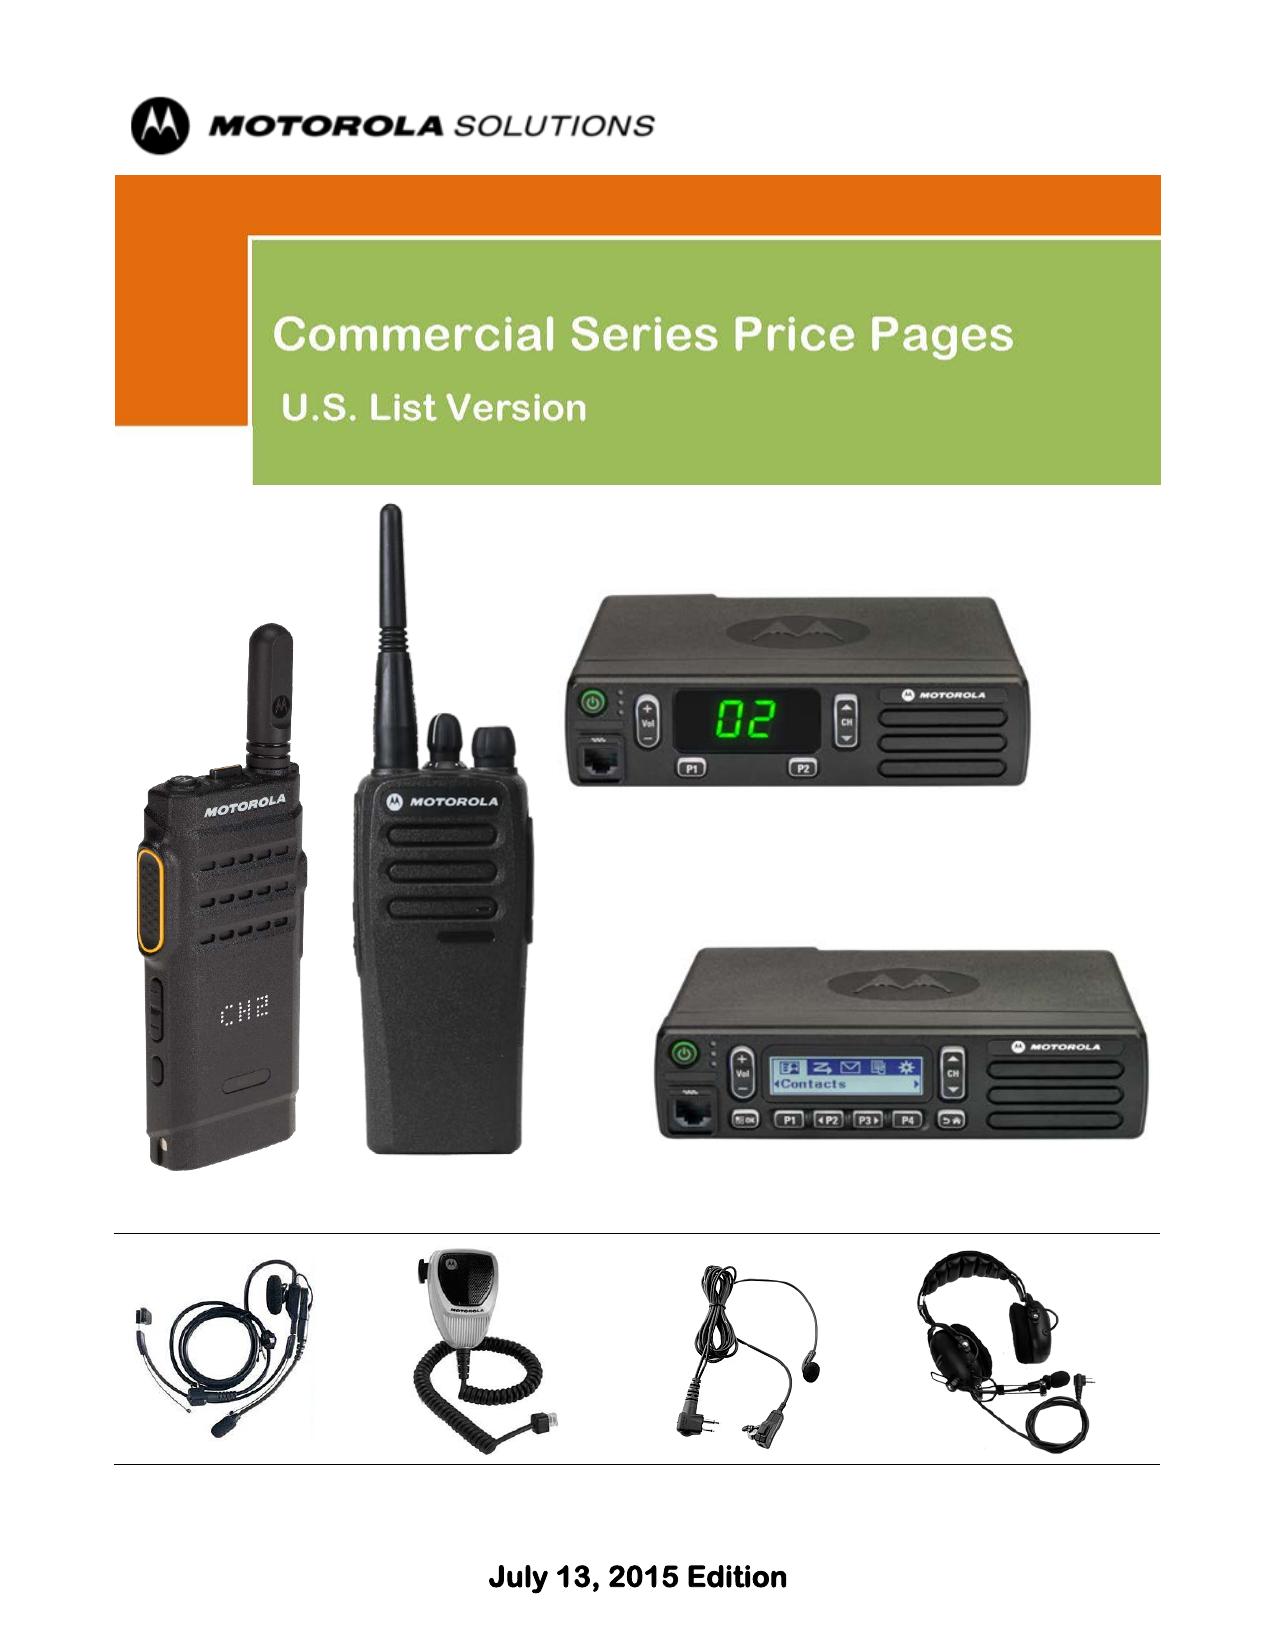 5x PMAD4012 VHF Stubby Antenna For Motorola PR400 CP150 CP200 CP200D EP350 Radio